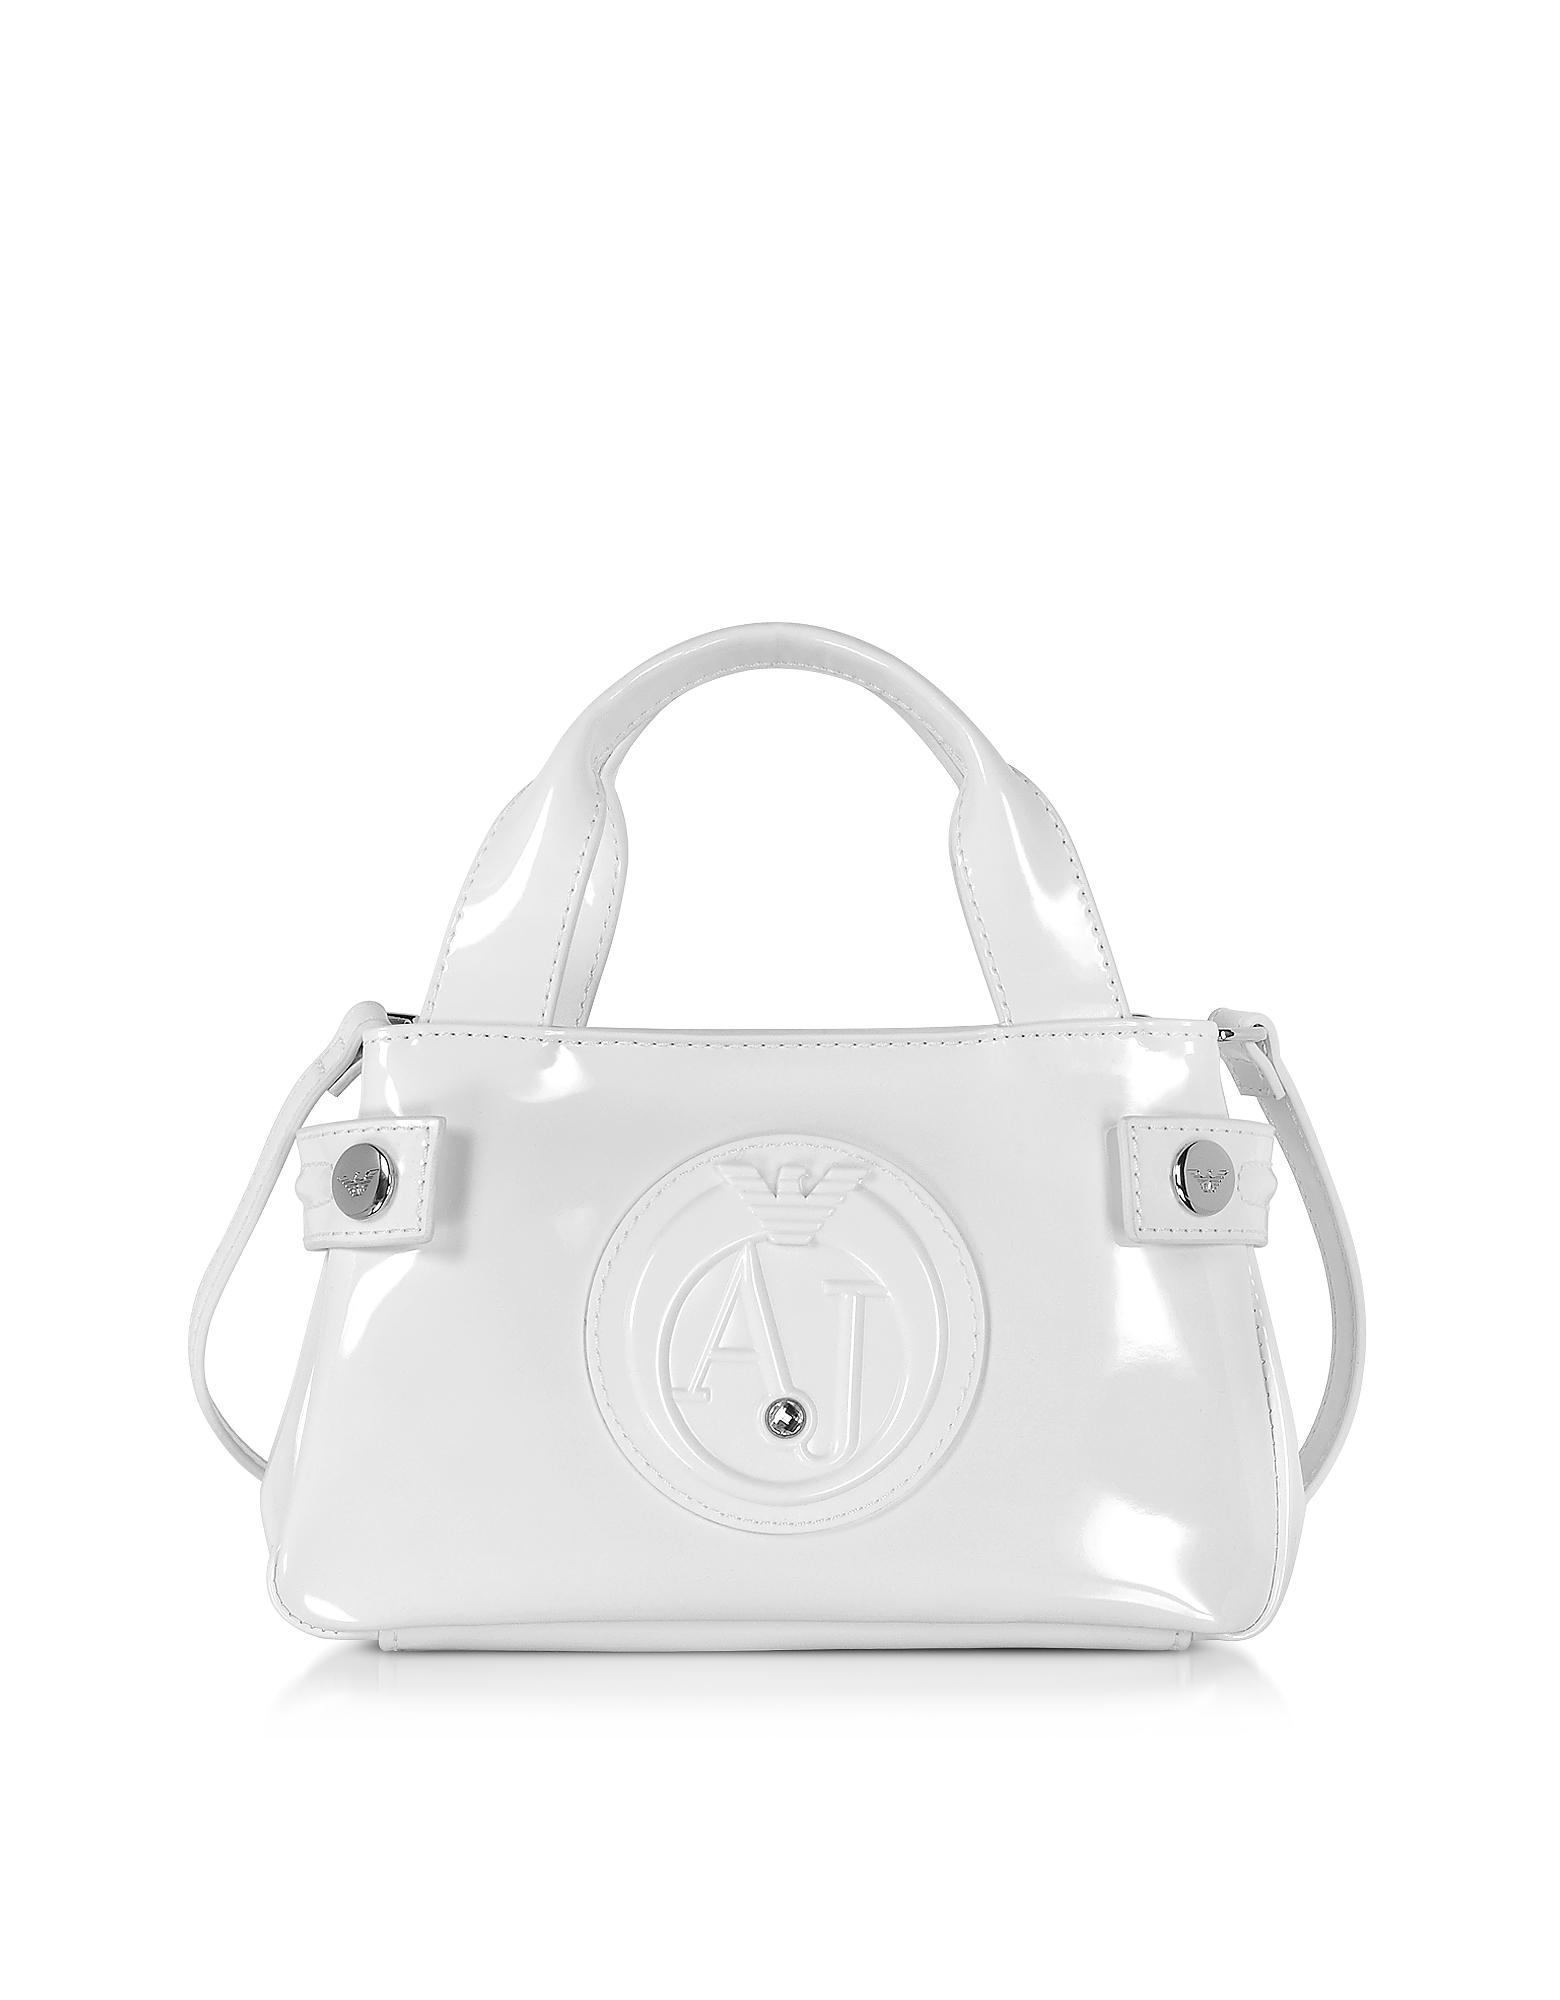 Armani Jeans Handbags, Signature Mini Patent Leather Tote Bag